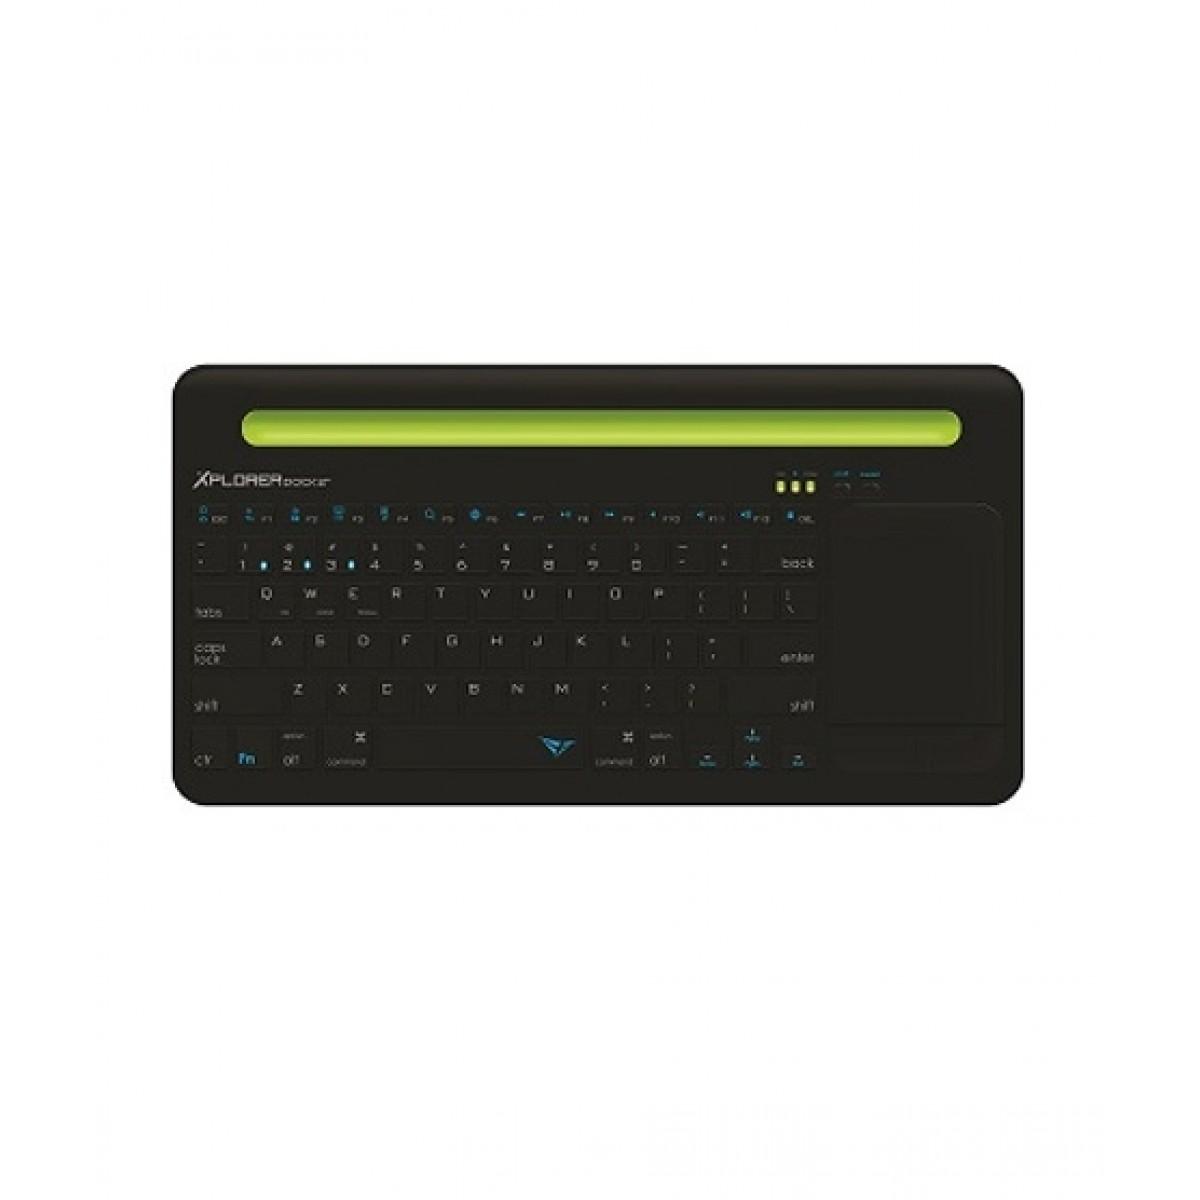 Alcatroz Xplorer Dock 2 Bluetooth Keyboard Black/Green